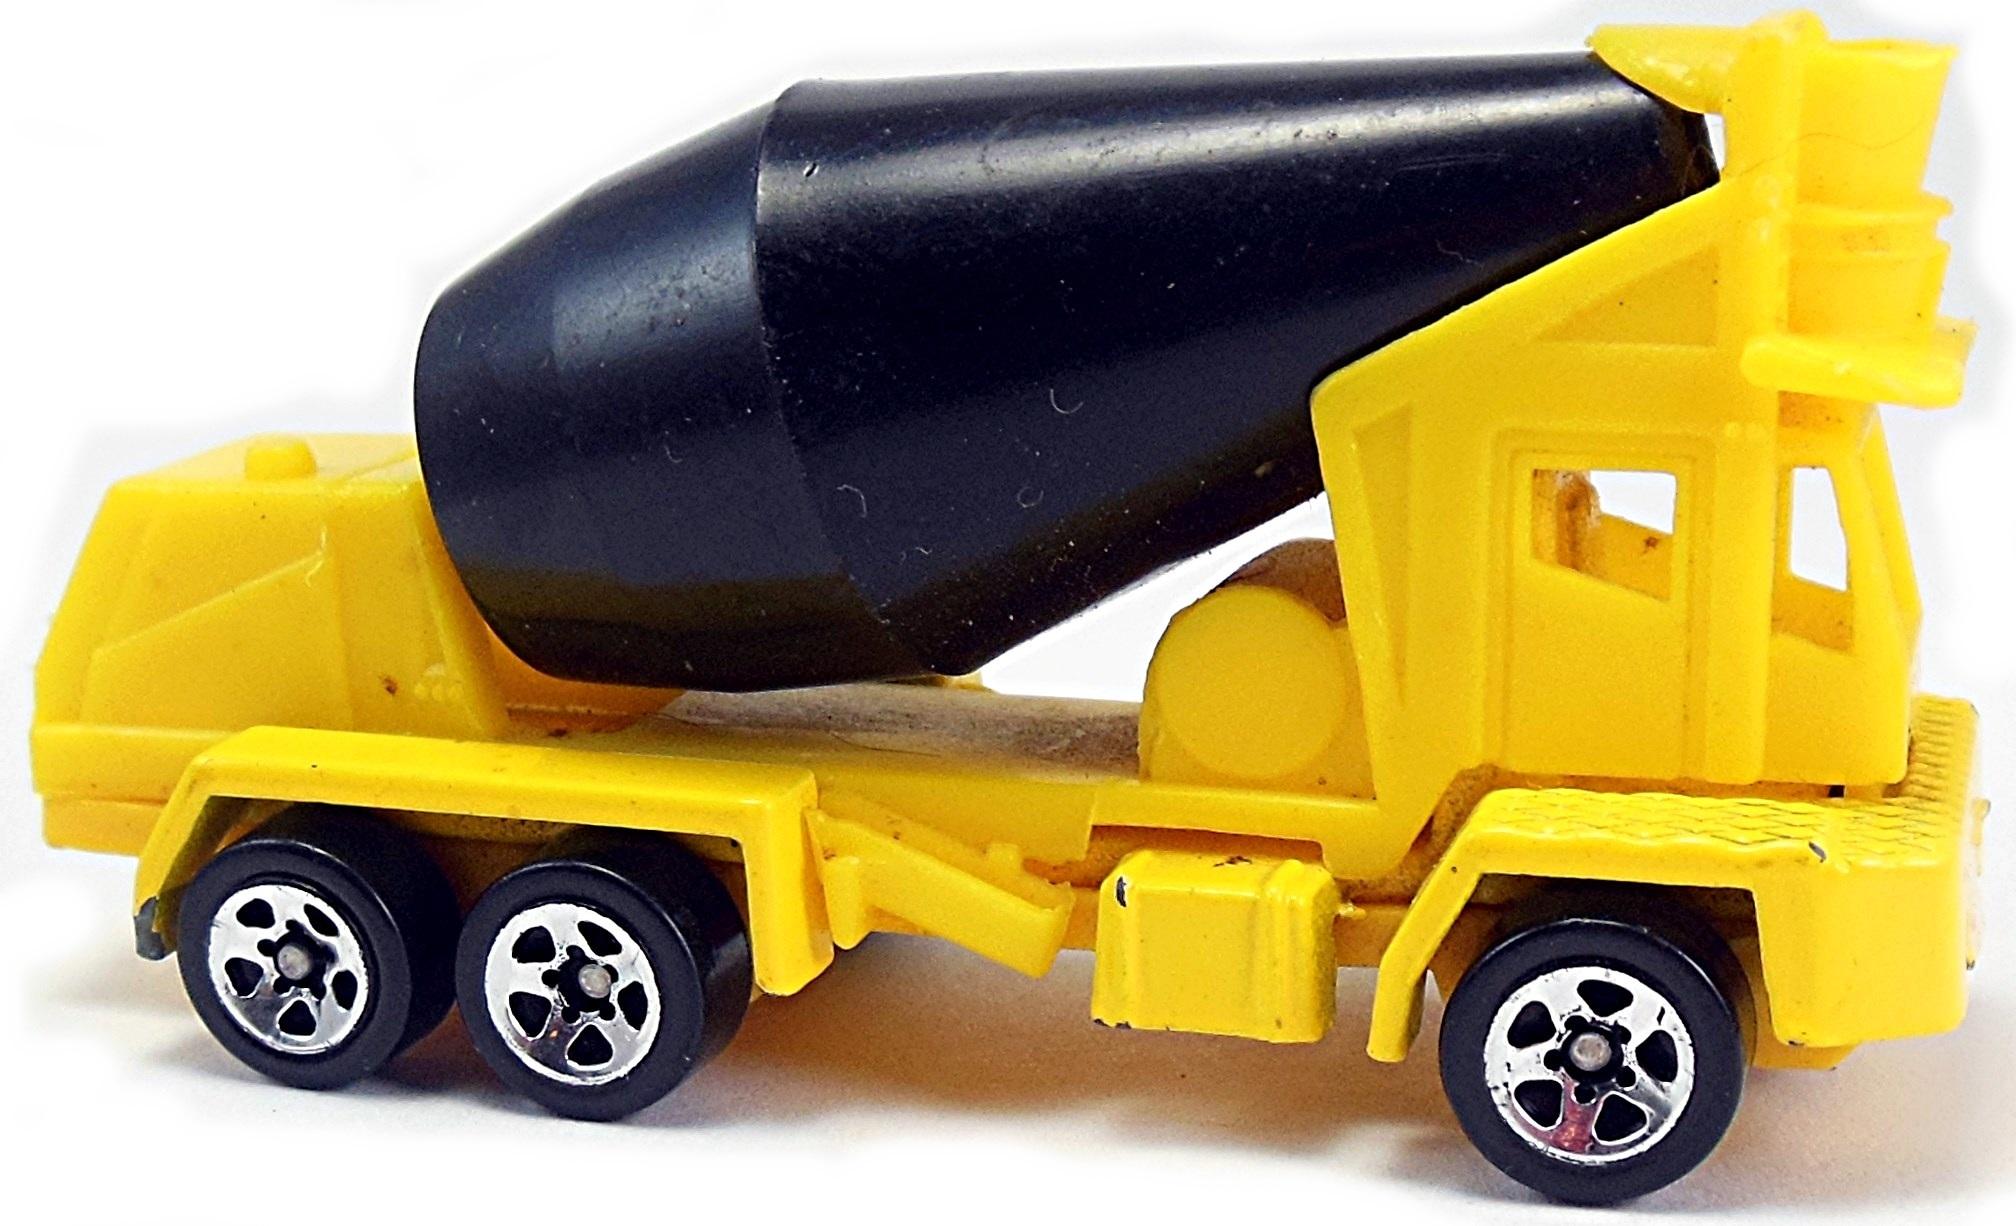 Hot Wheels 1998 1:64 Scale Yellow Oshkosh Concrete Mixer Die Cast Car Collector #863 Mattel